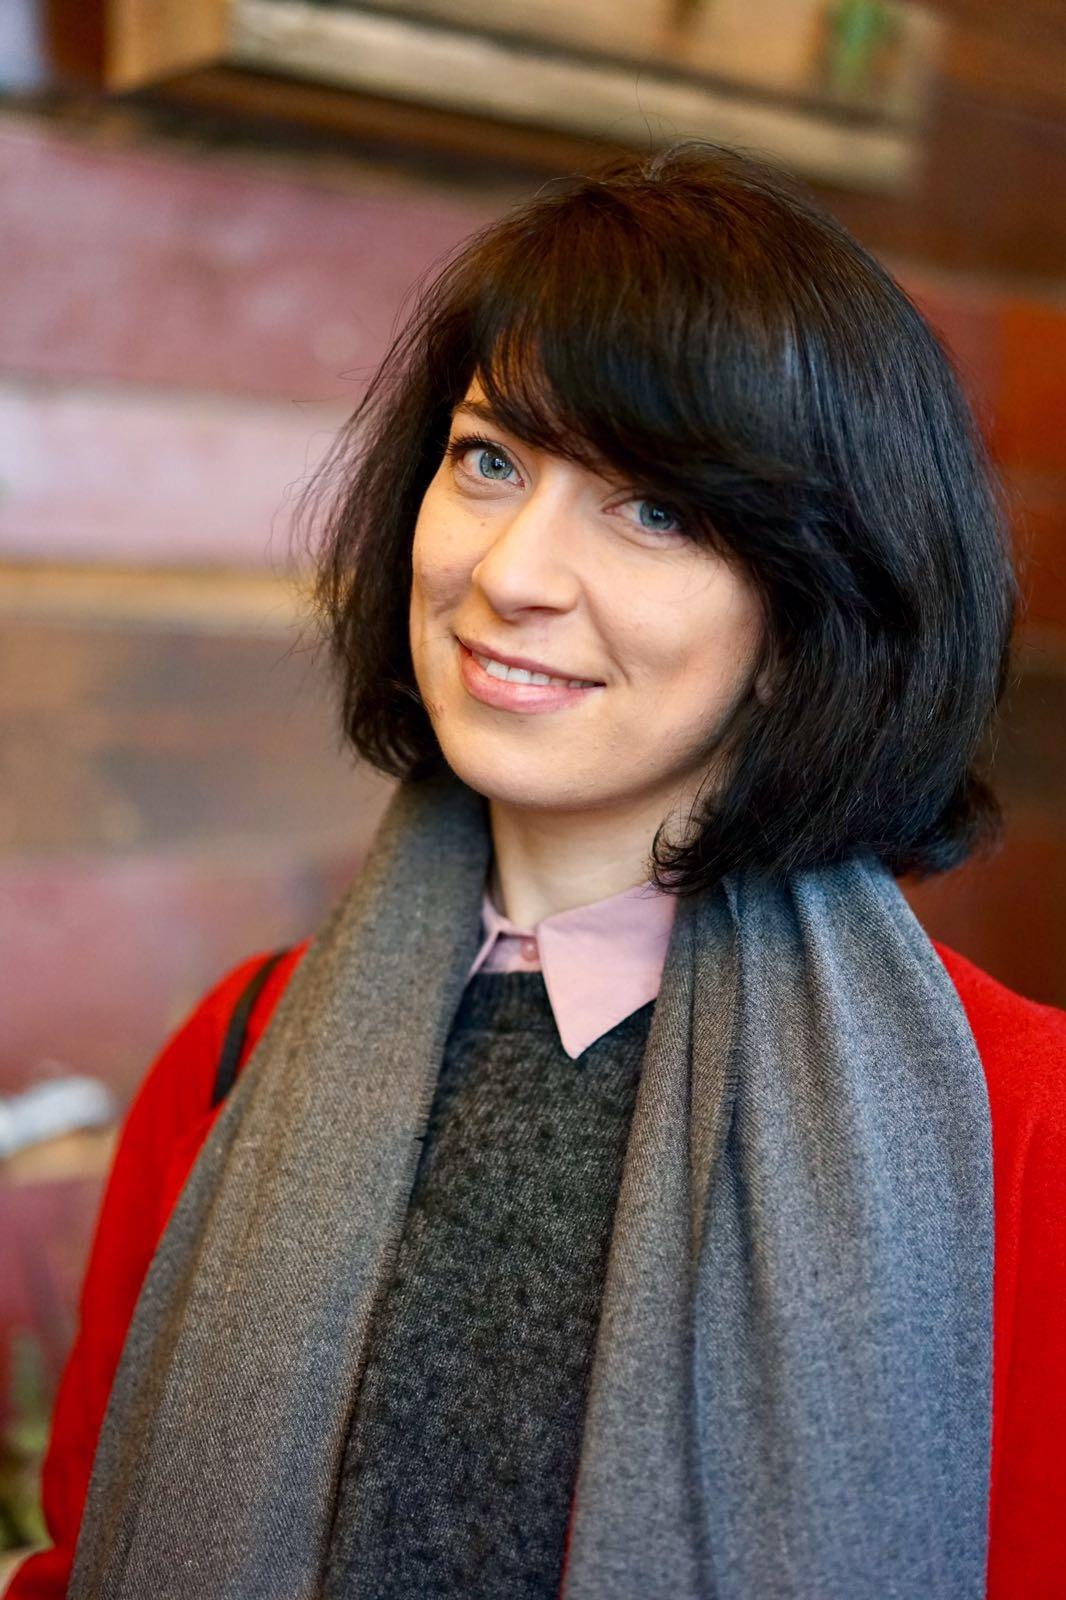 Guest author Laura McLeod